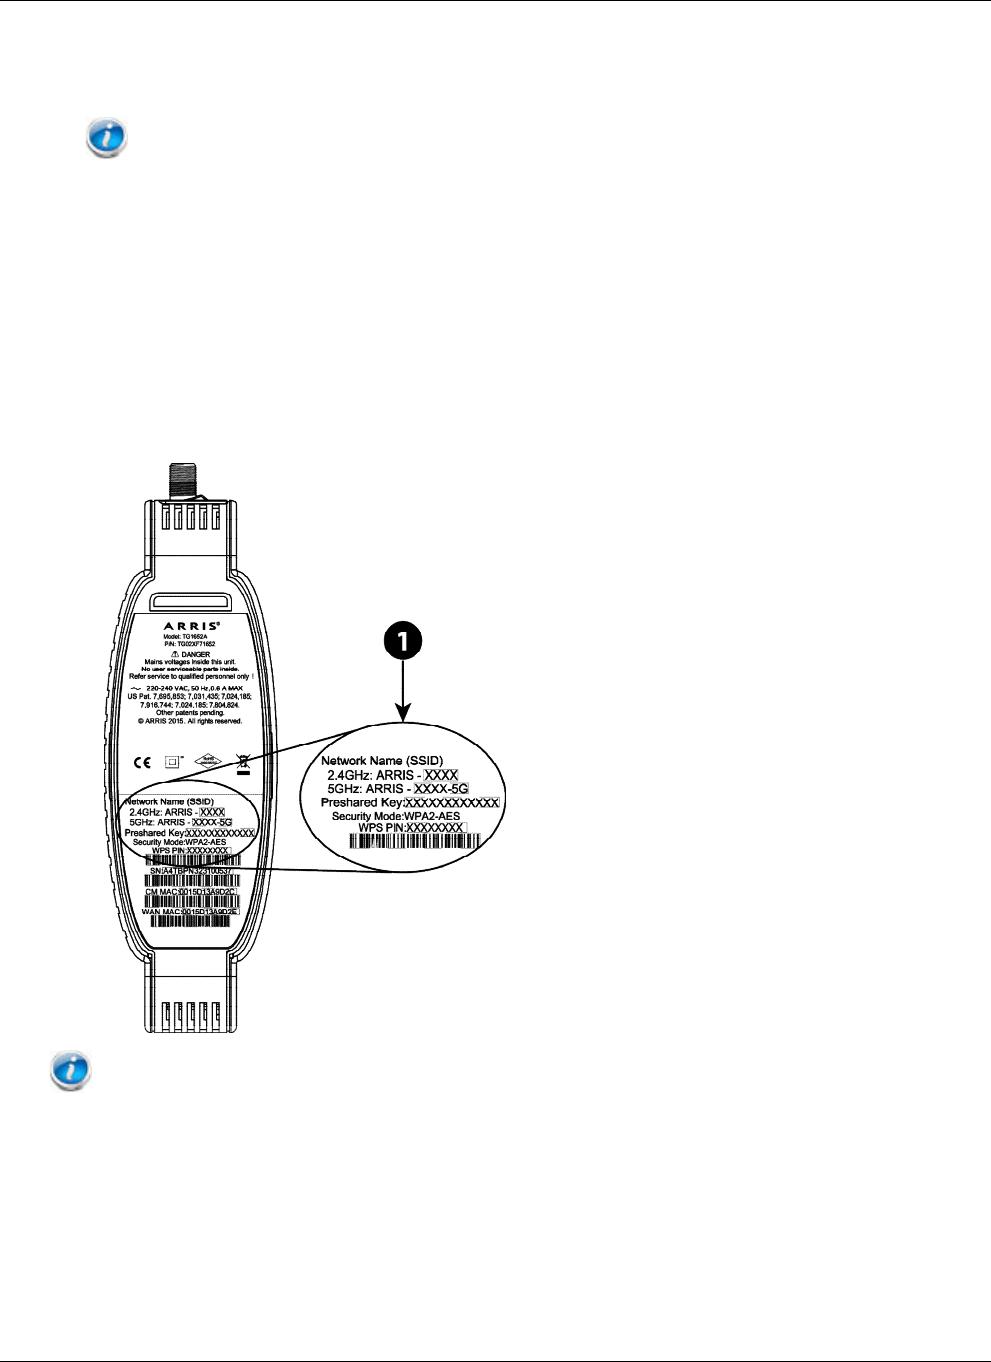 Arris TG1652A User Manual TG1652A: Guide